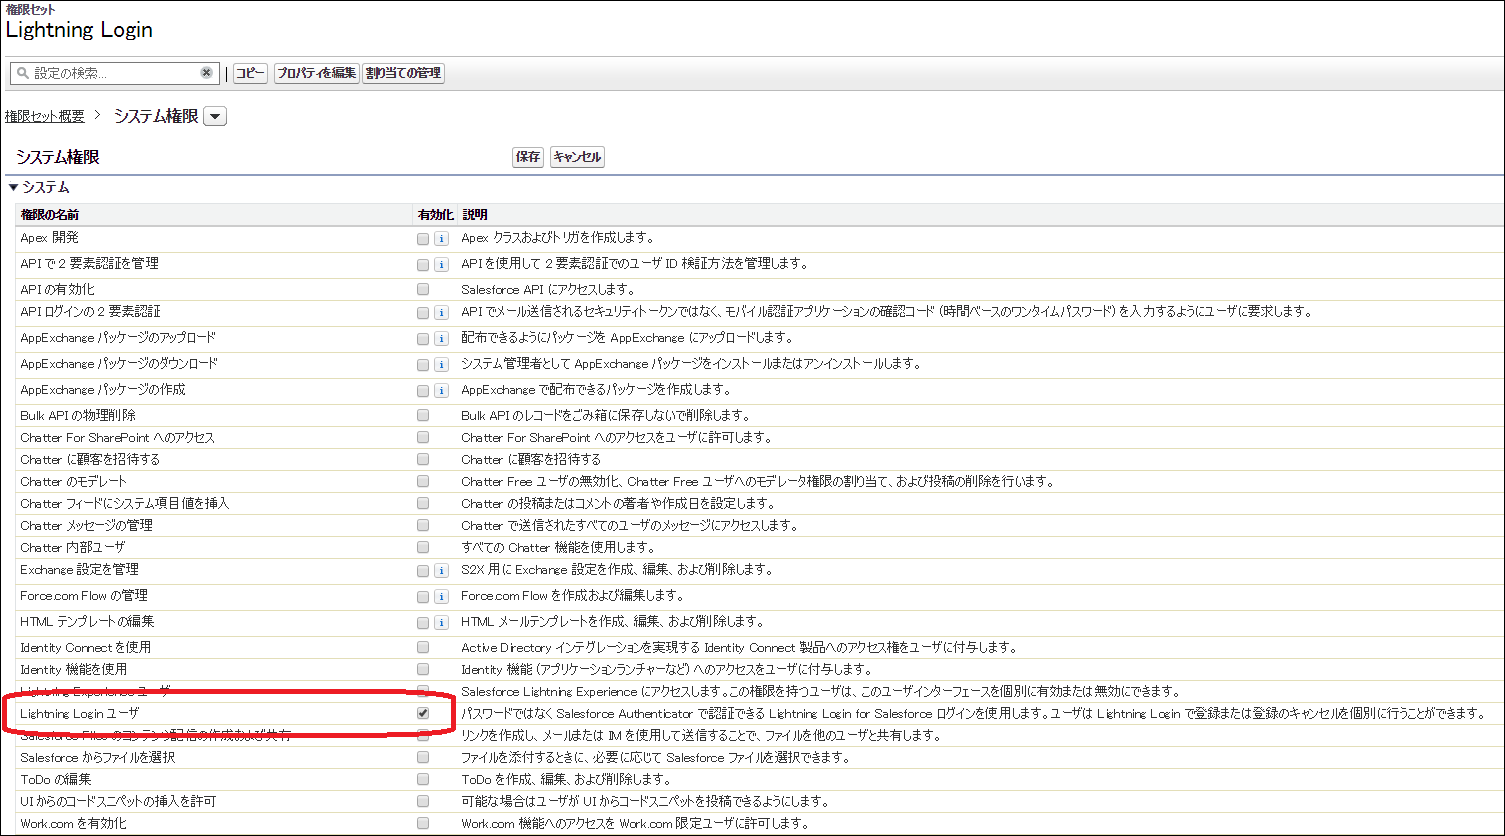 http://blogs.itmedia.co.jp/sadahiro29/no28/Pic28-2.png